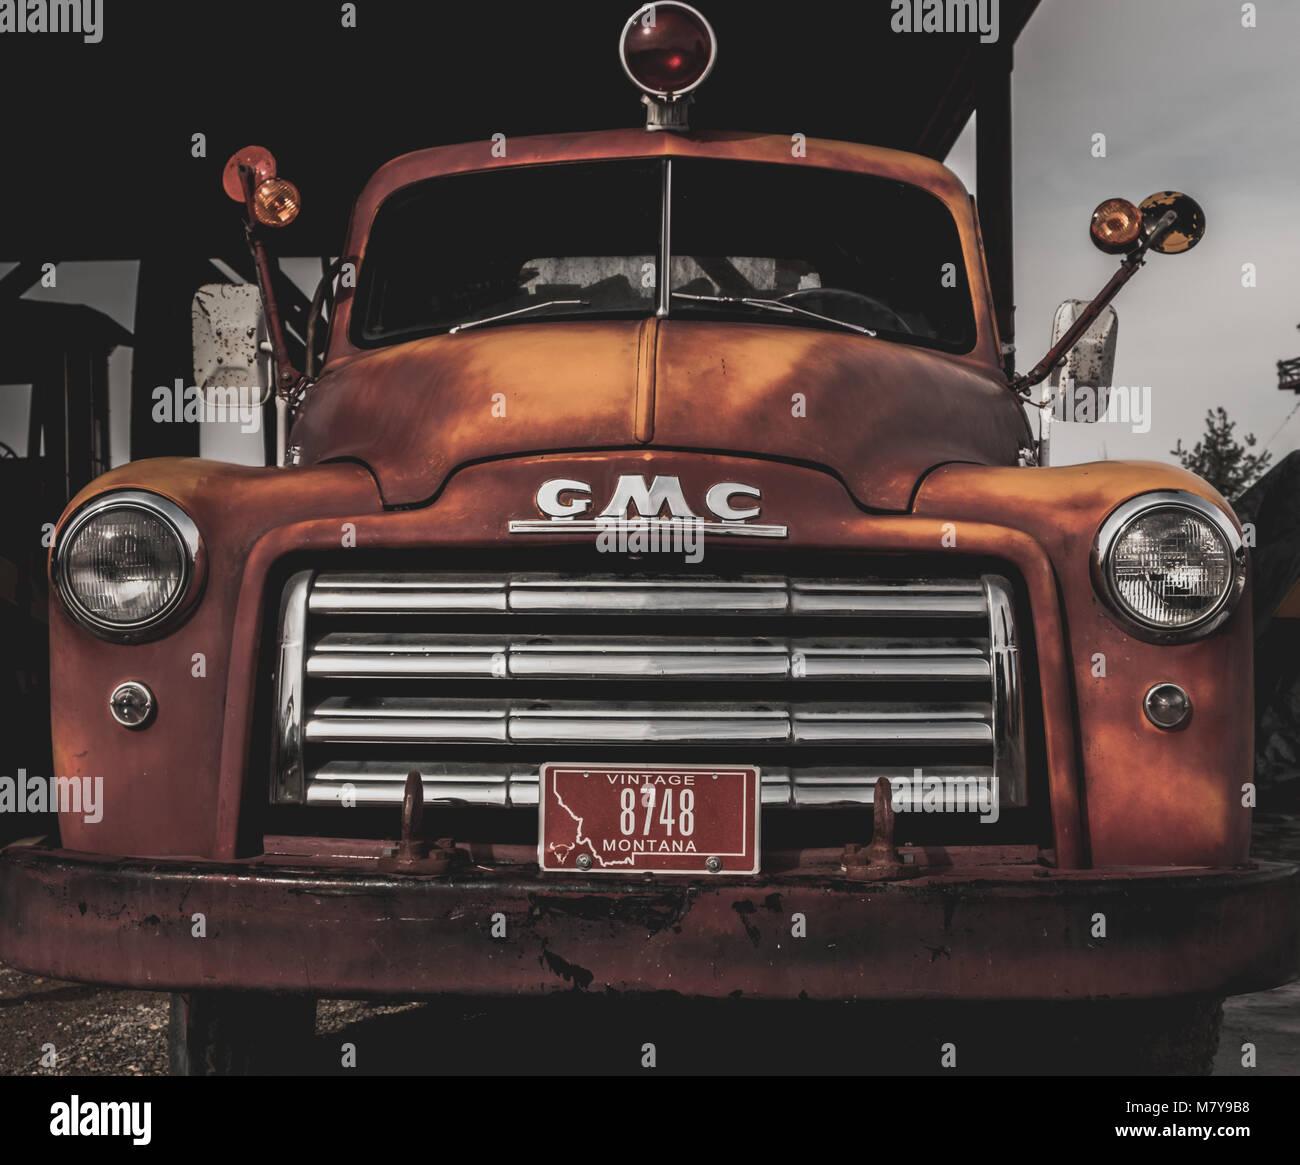 Diamond Auto Group Is A Auburn Buick Chevrolet Gmc: Truck Classic 1940s Stock Photos & Truck Classic 1940s